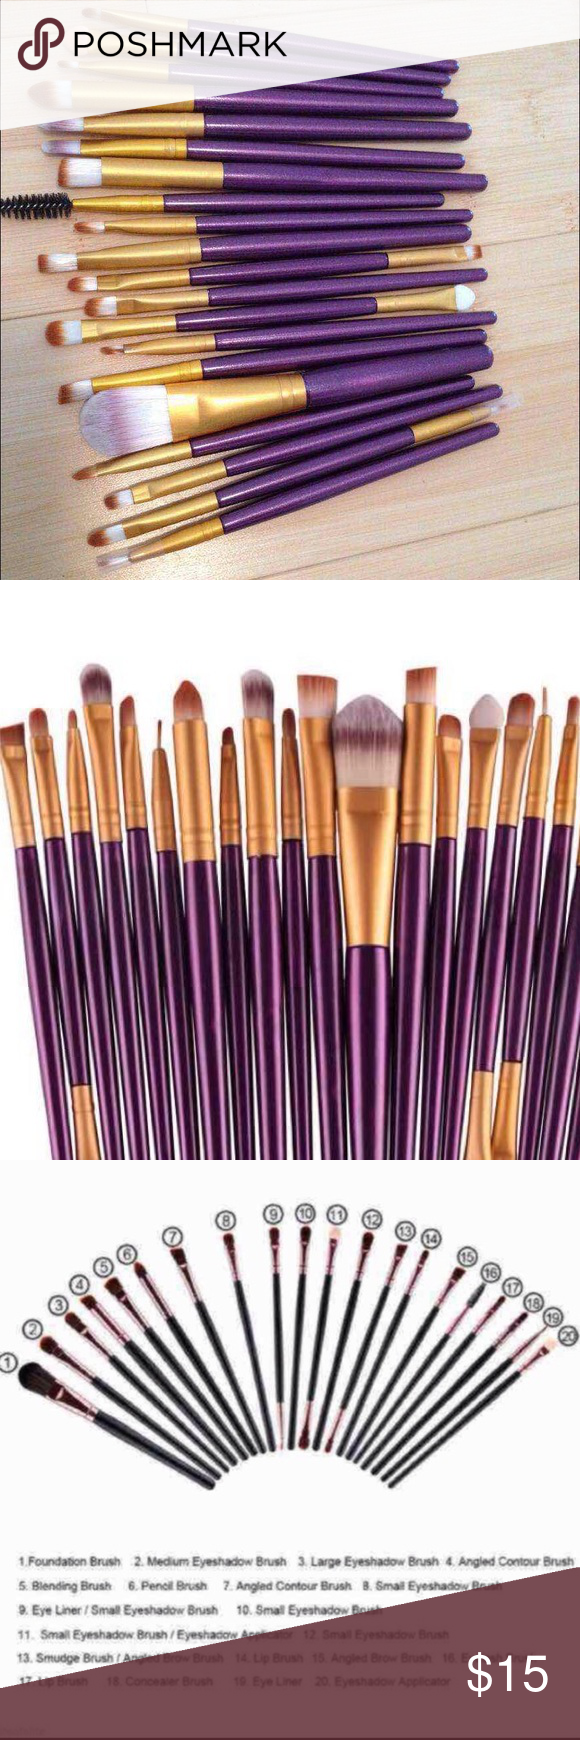 New 20pcs Makeup Brushes 20pcs Pro Makeup Sets Power